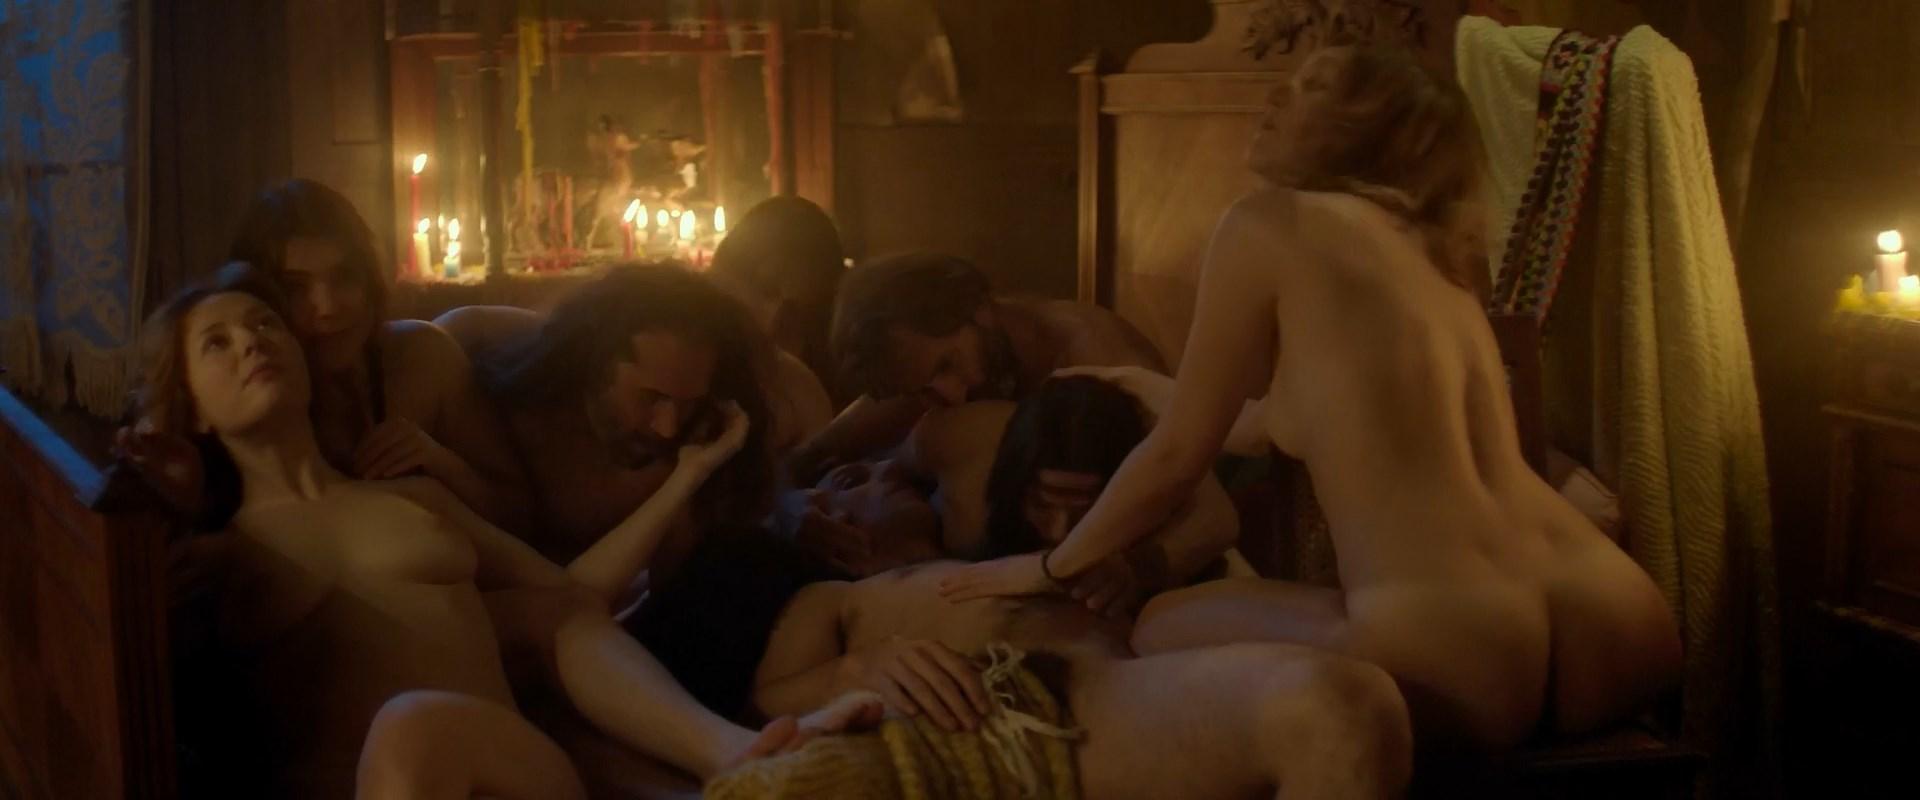 Fanny ardant film porno